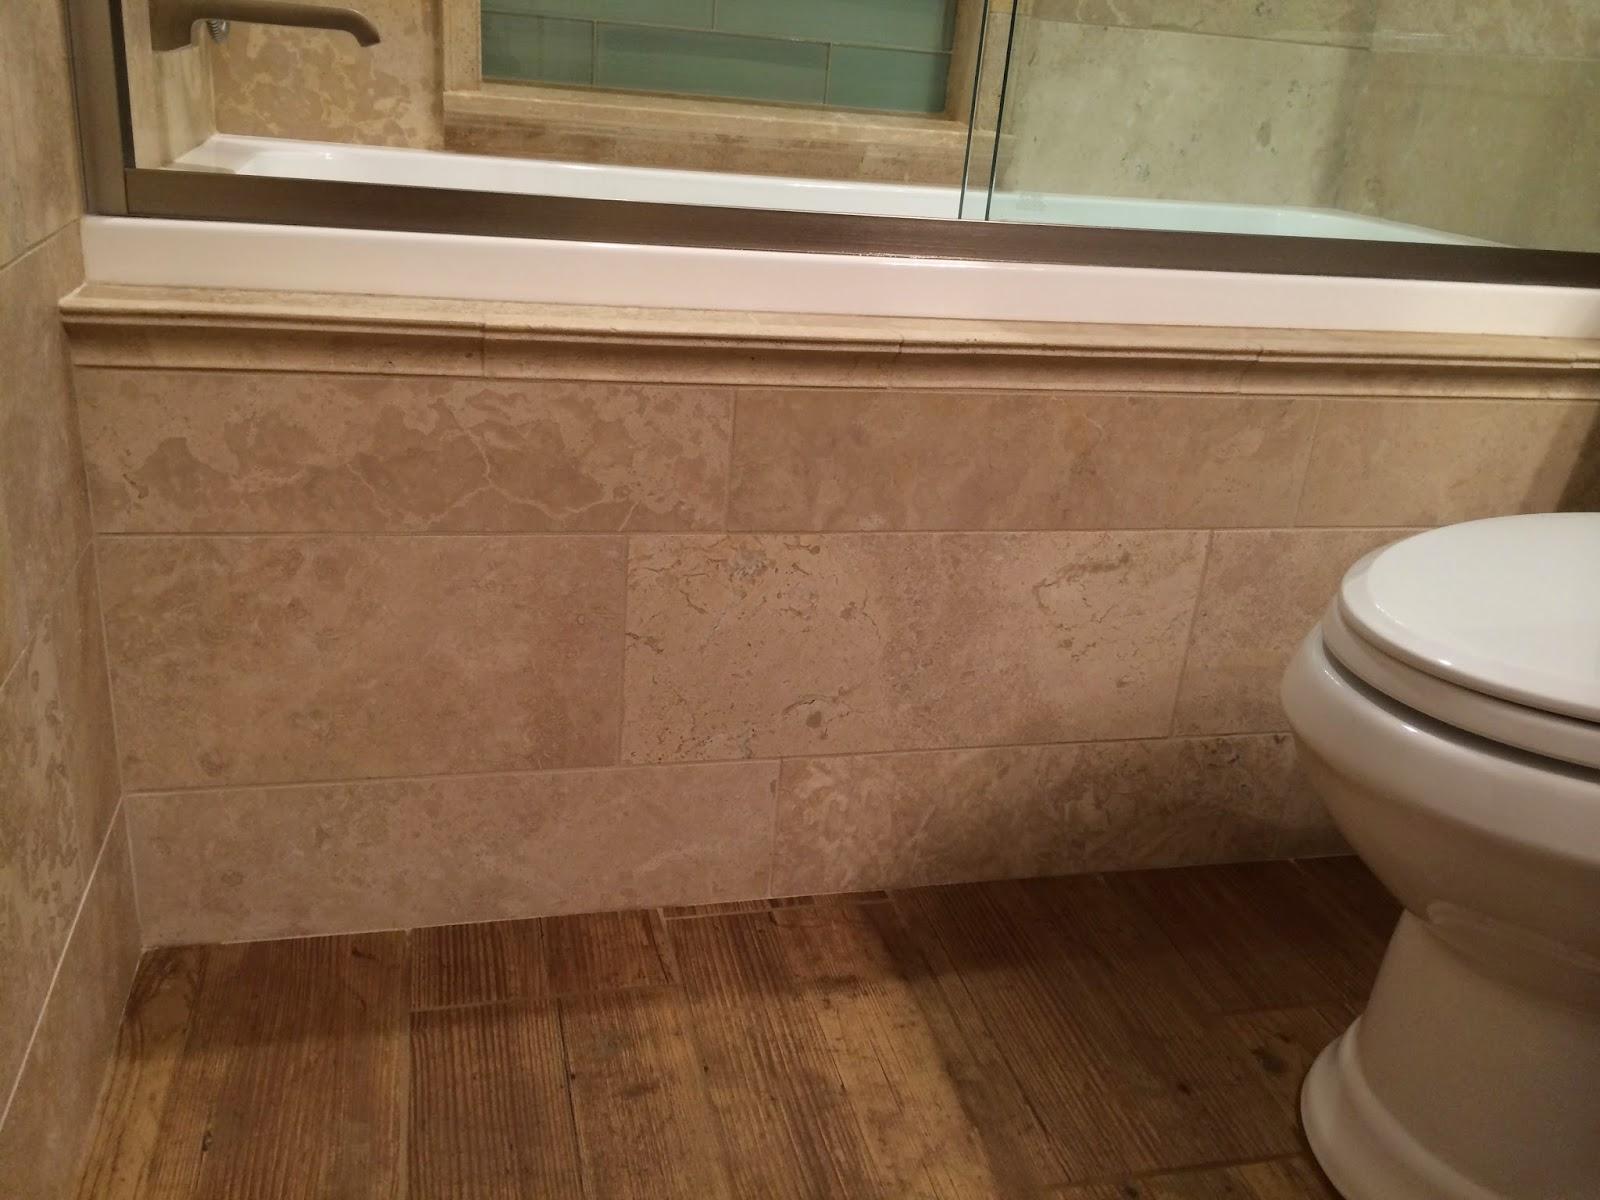 Custom Bathroom Remodeling Elegant Travertine Bathroom Remodel OctoberNovember 2014